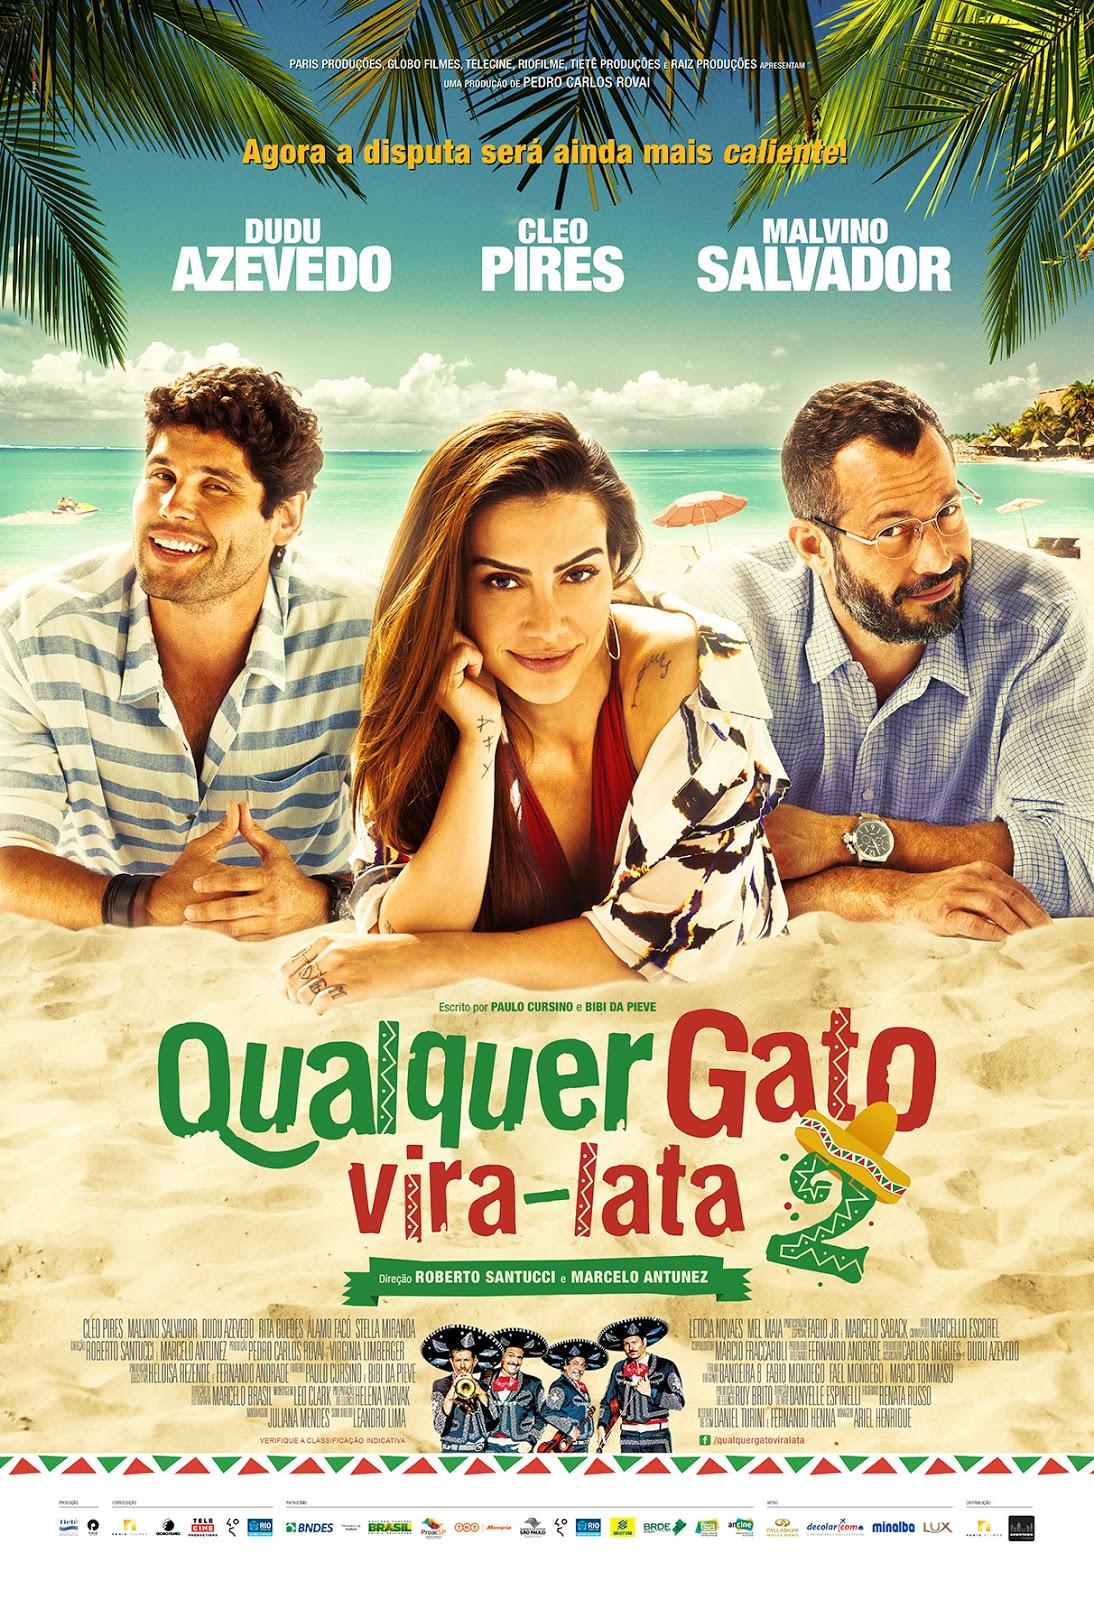 Qualquer Gato Vira-Lata 2 [Nac] – IMDB 5.6